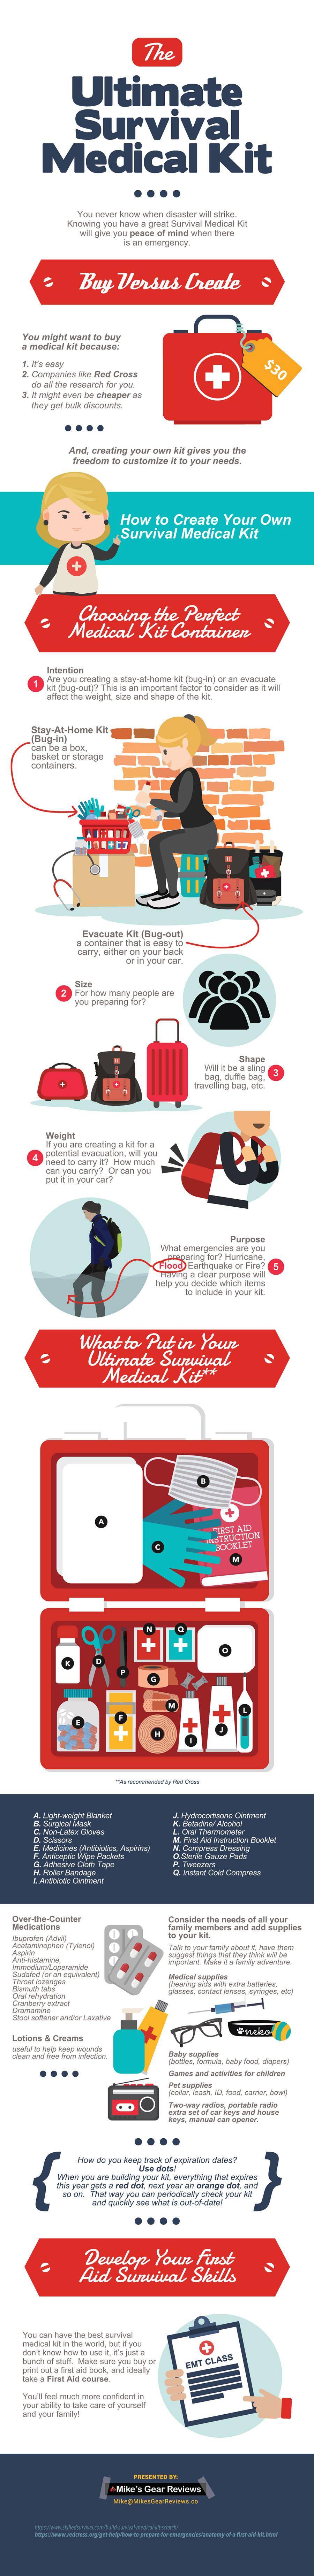 The Ultimate Emergency Survival Medical Kit